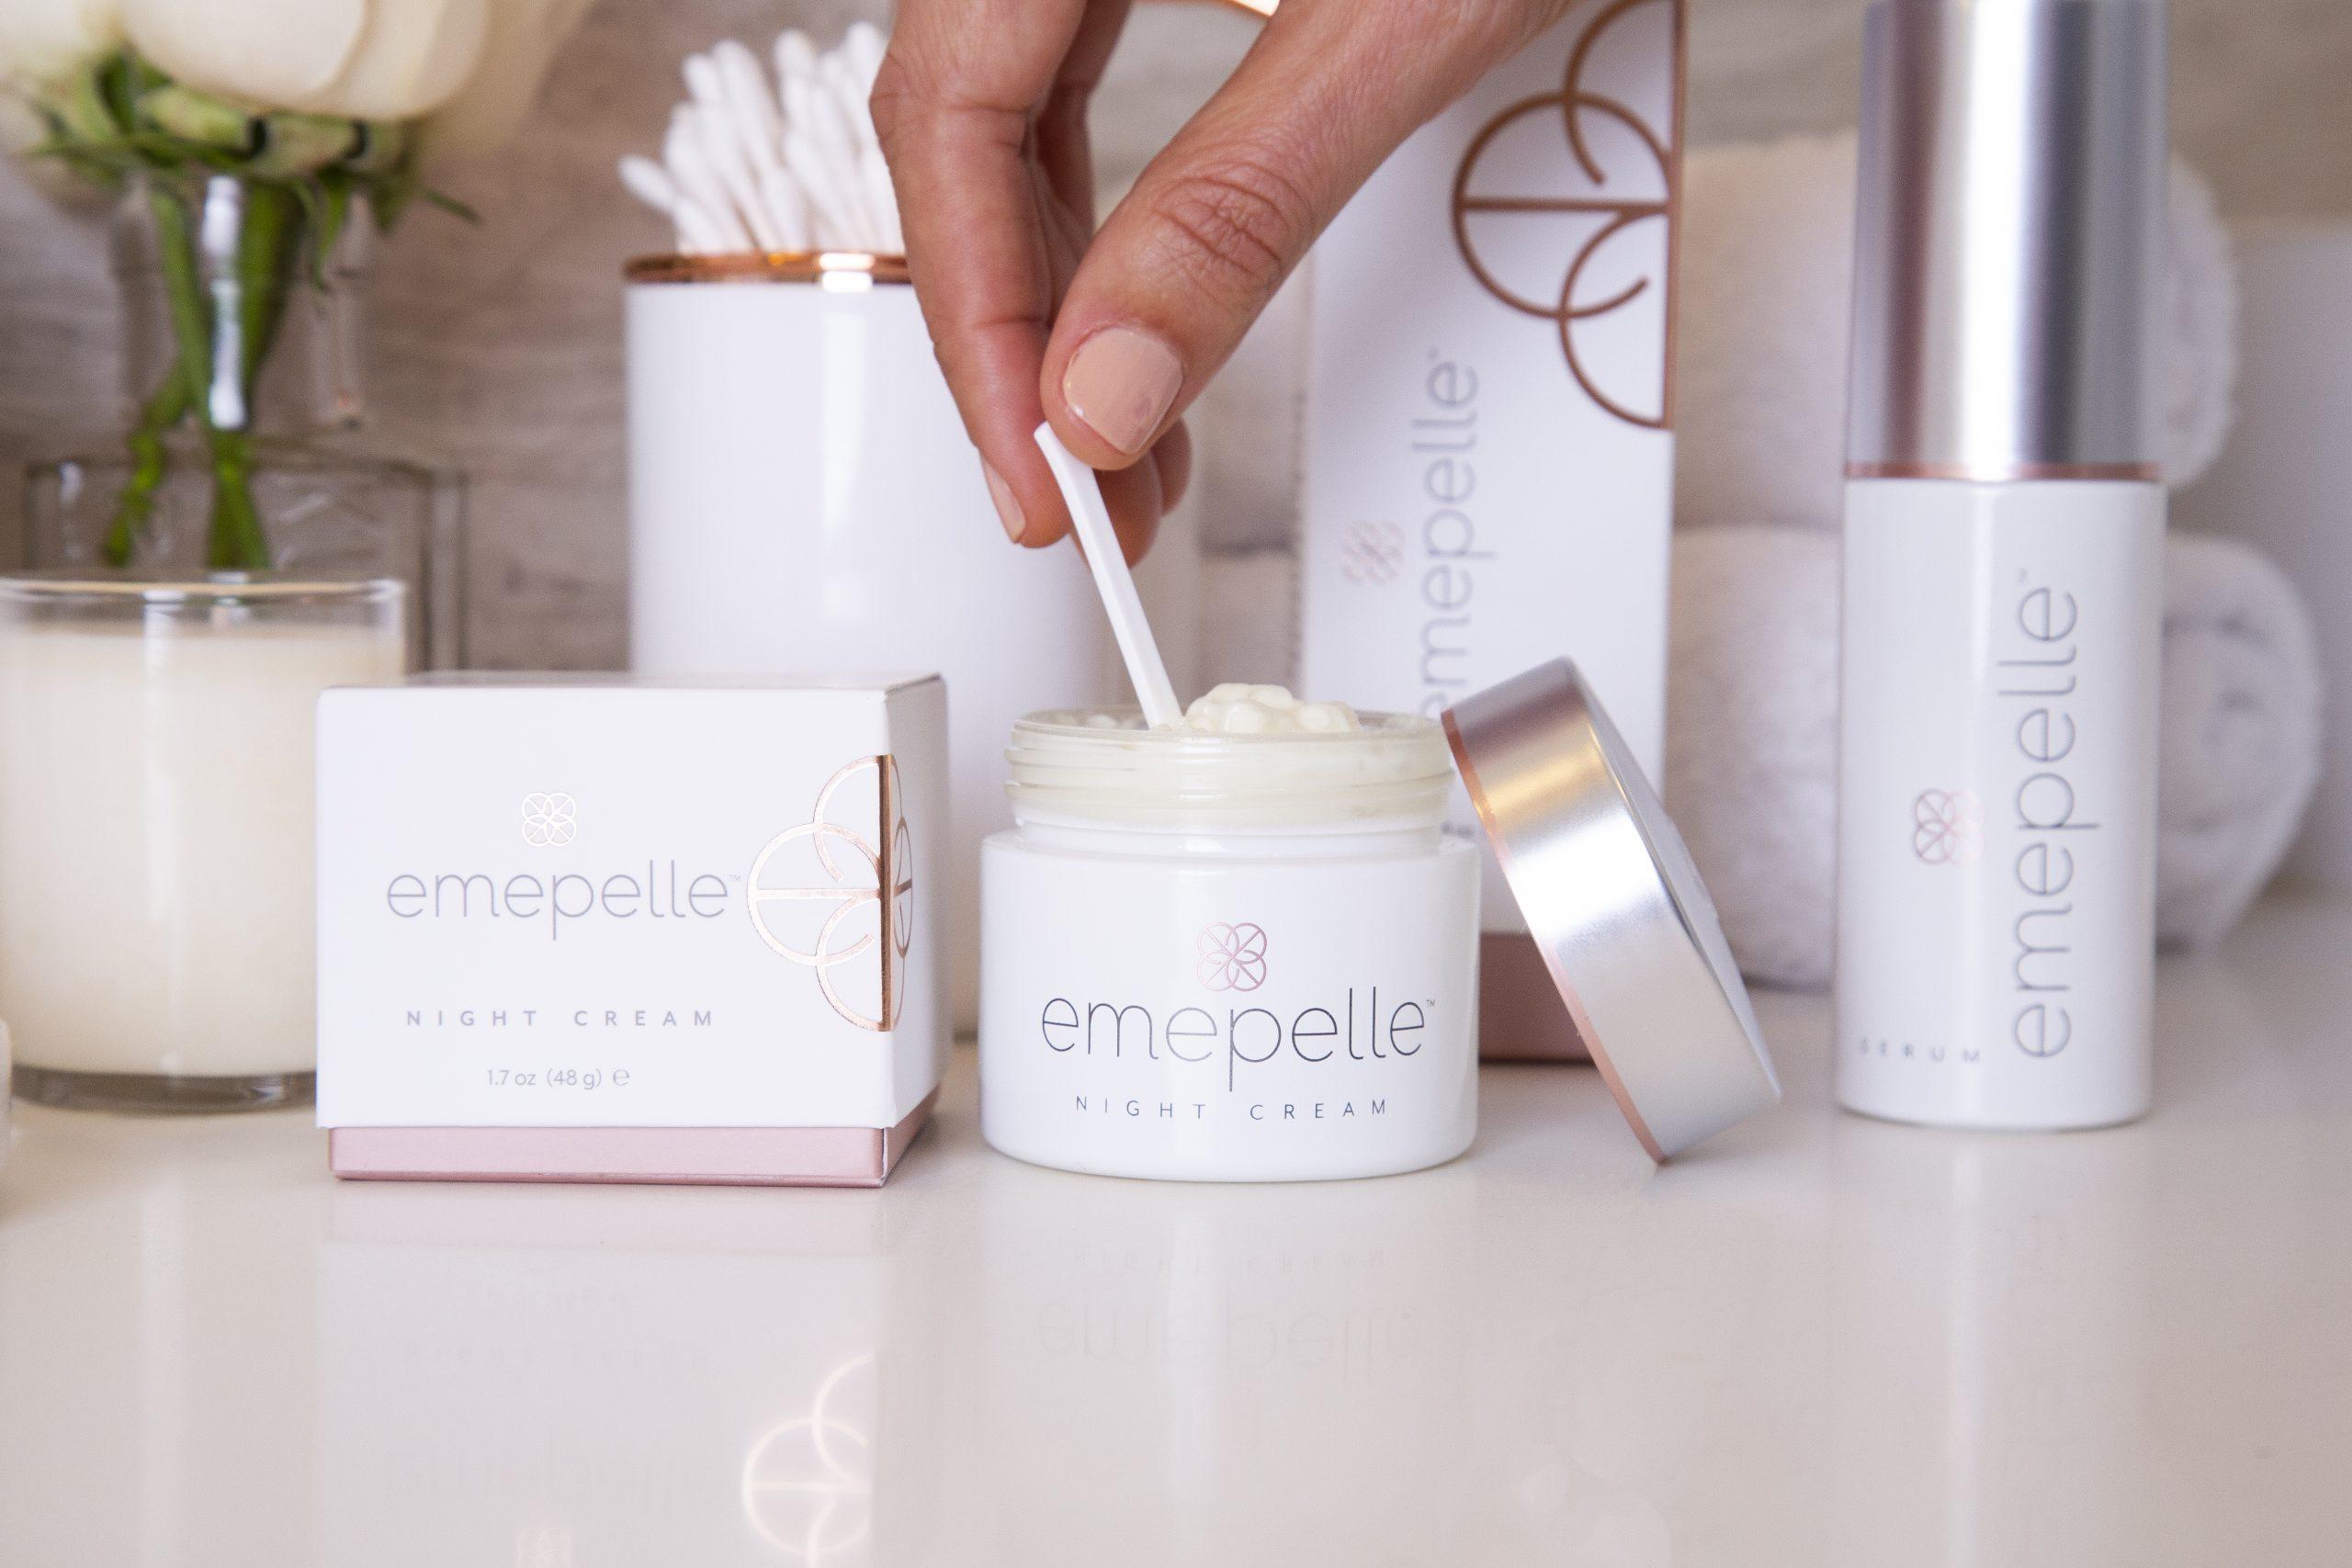 Emepelle™ Serum & Night Cream